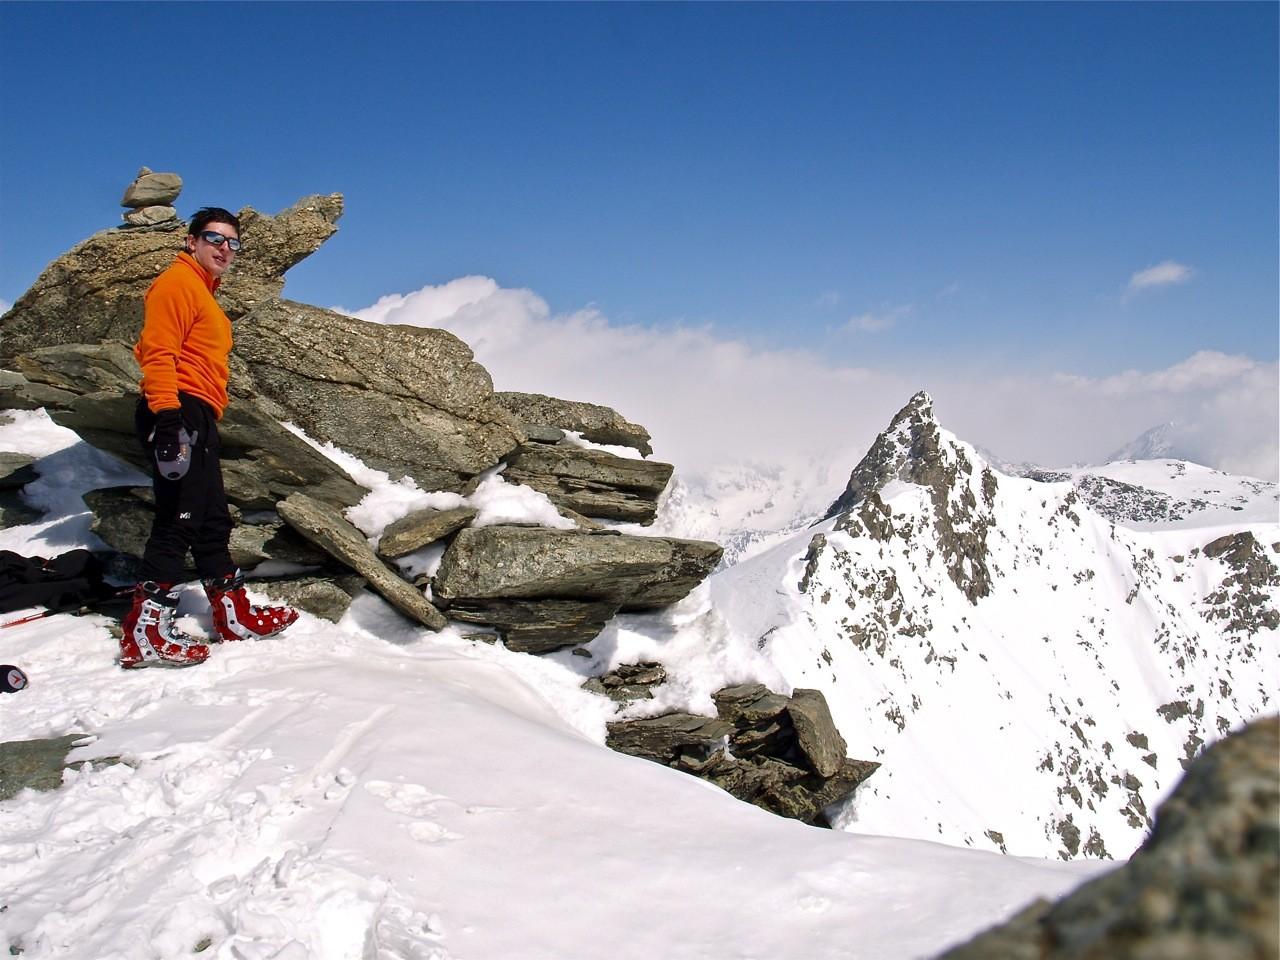 Sommet du Mont de Gréboulaz